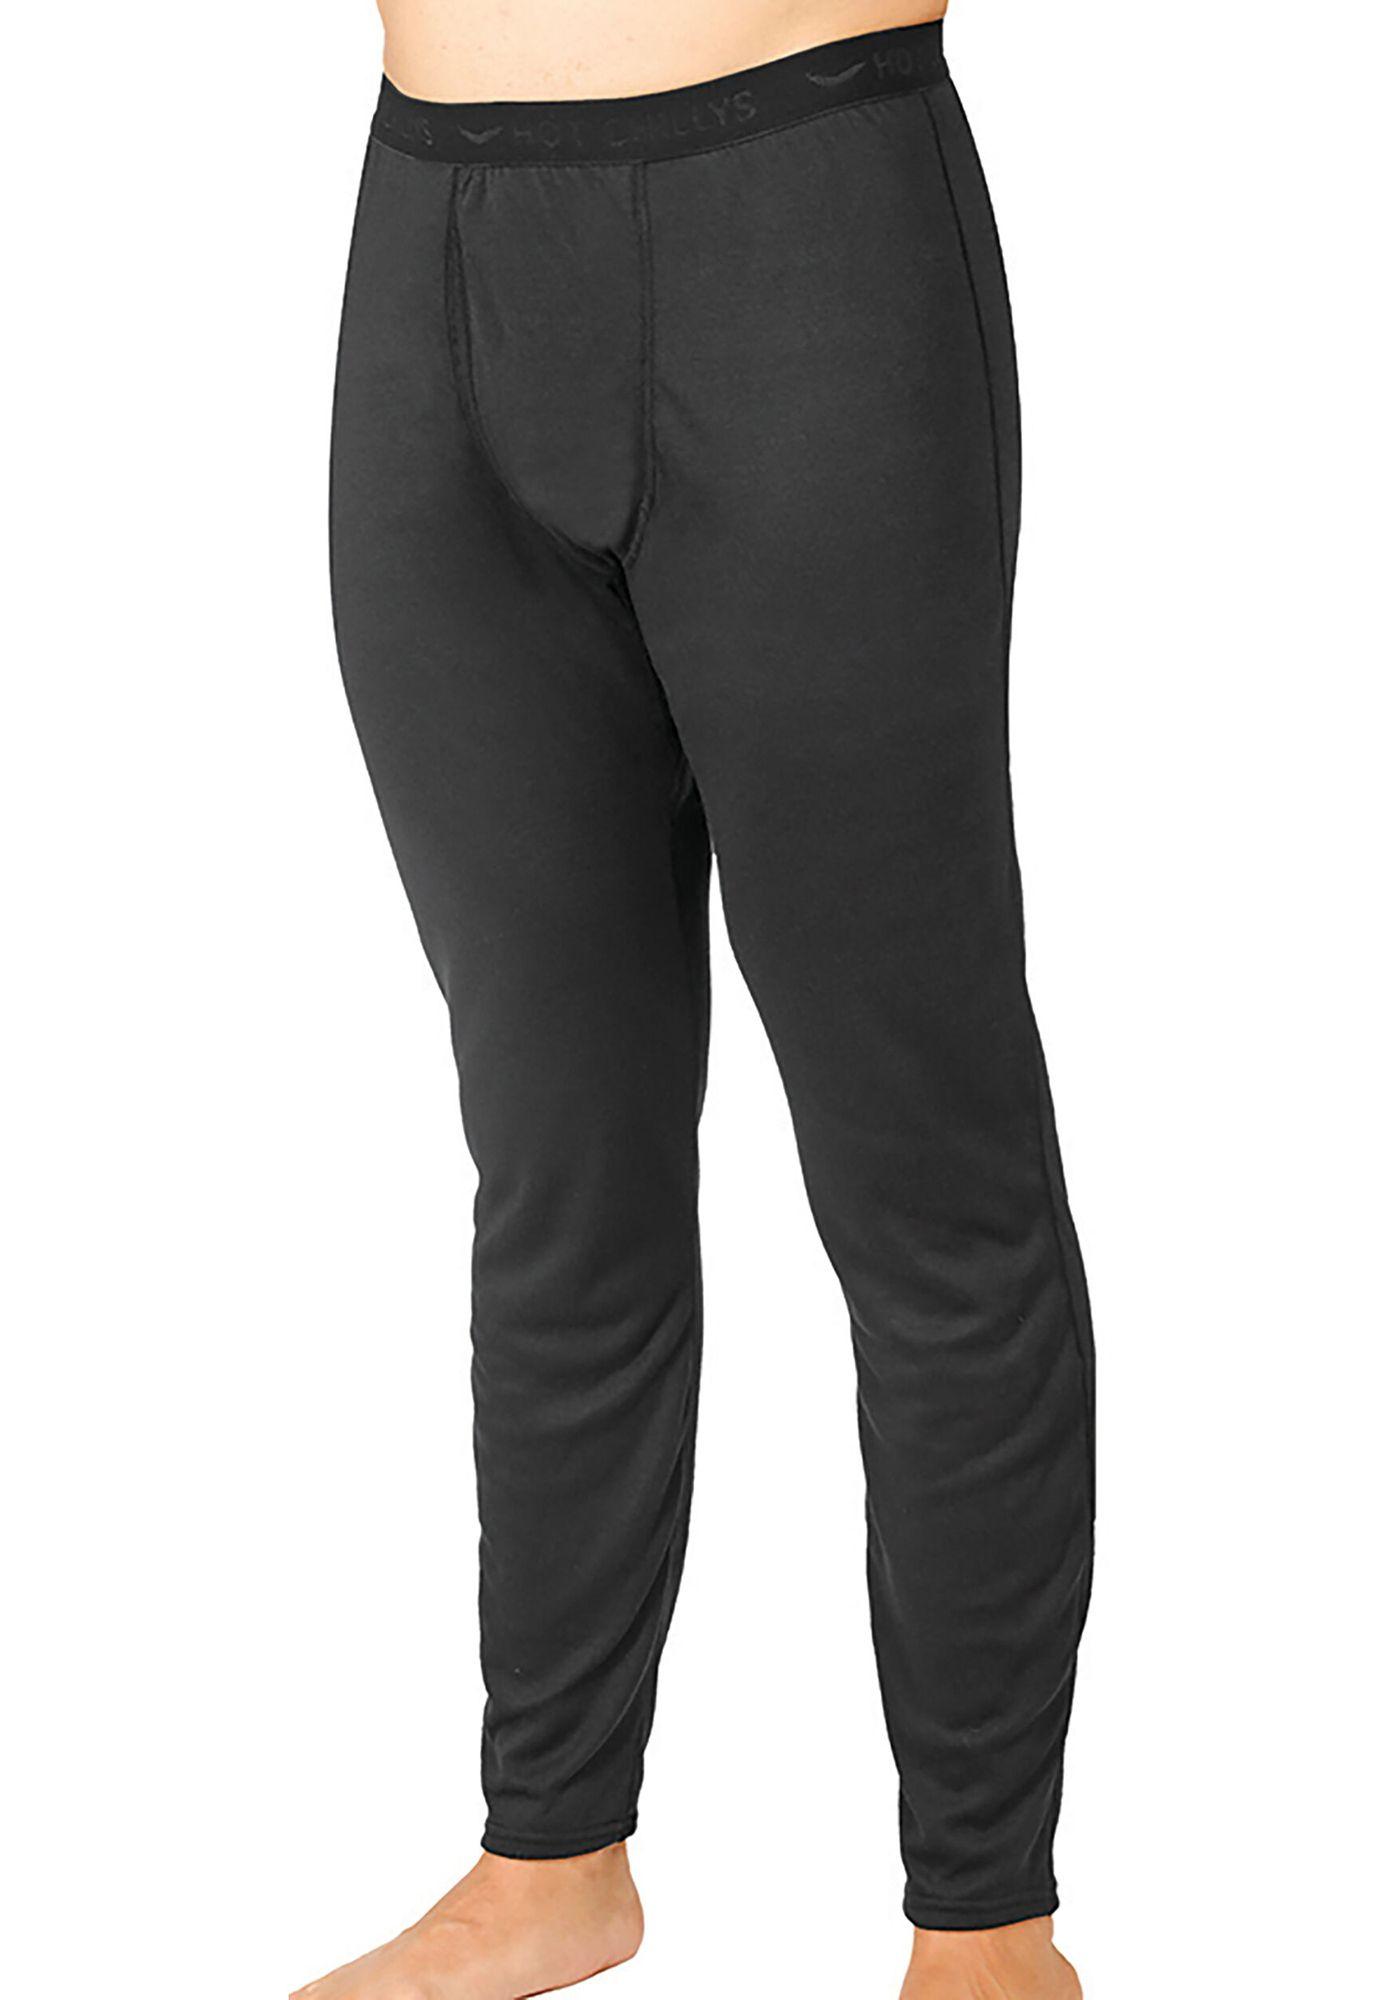 Hot Chillys Men's Pepper Bi-Ply Pants